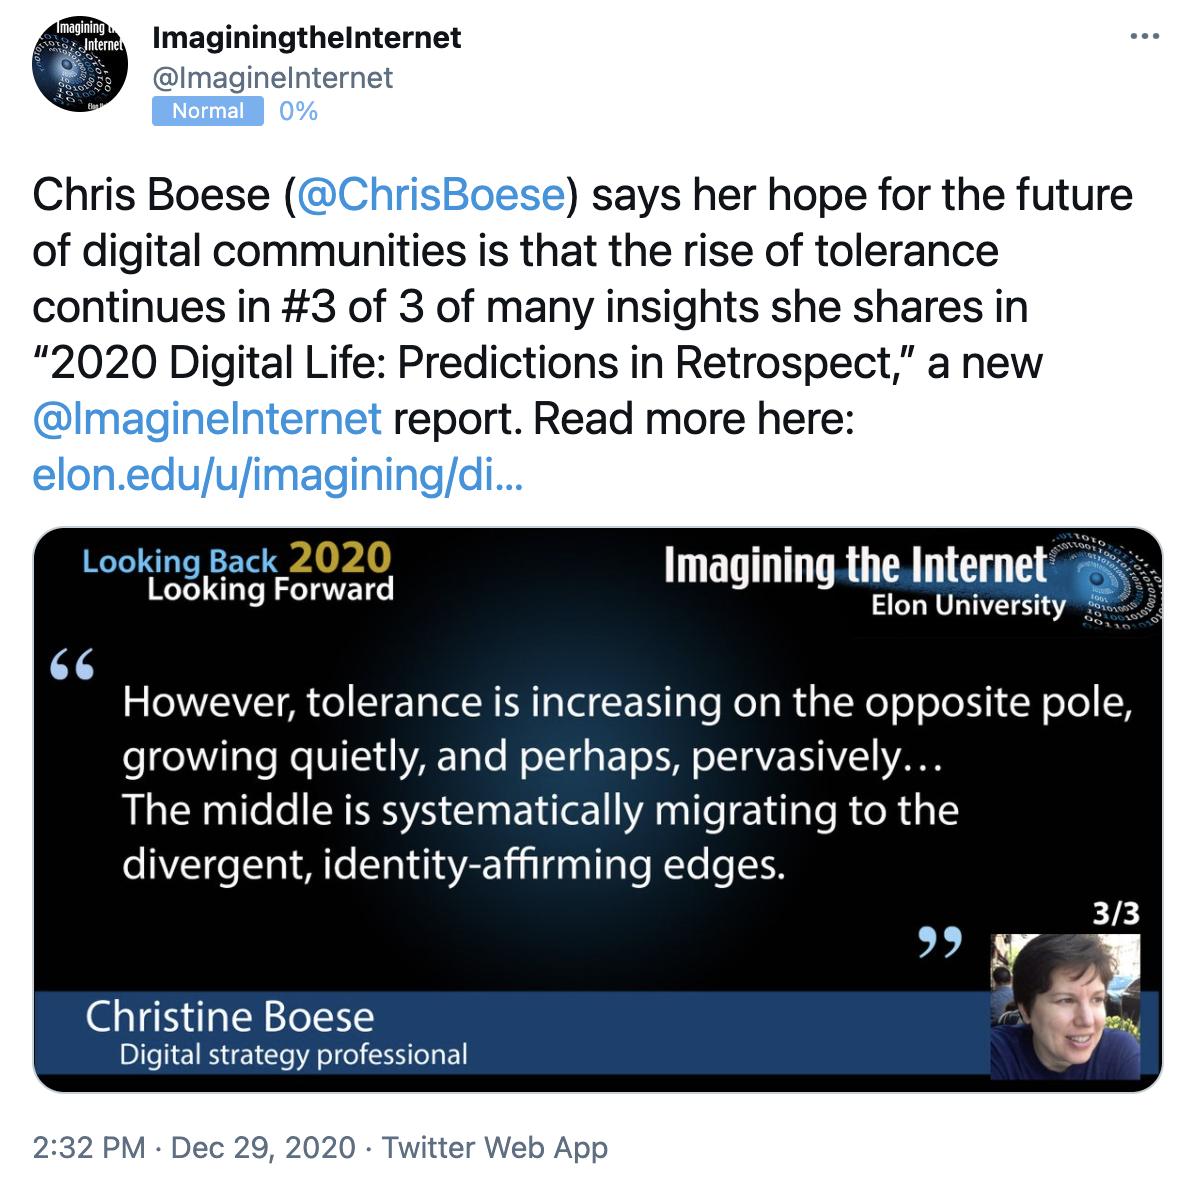 3 of 3 Imagining the Internet